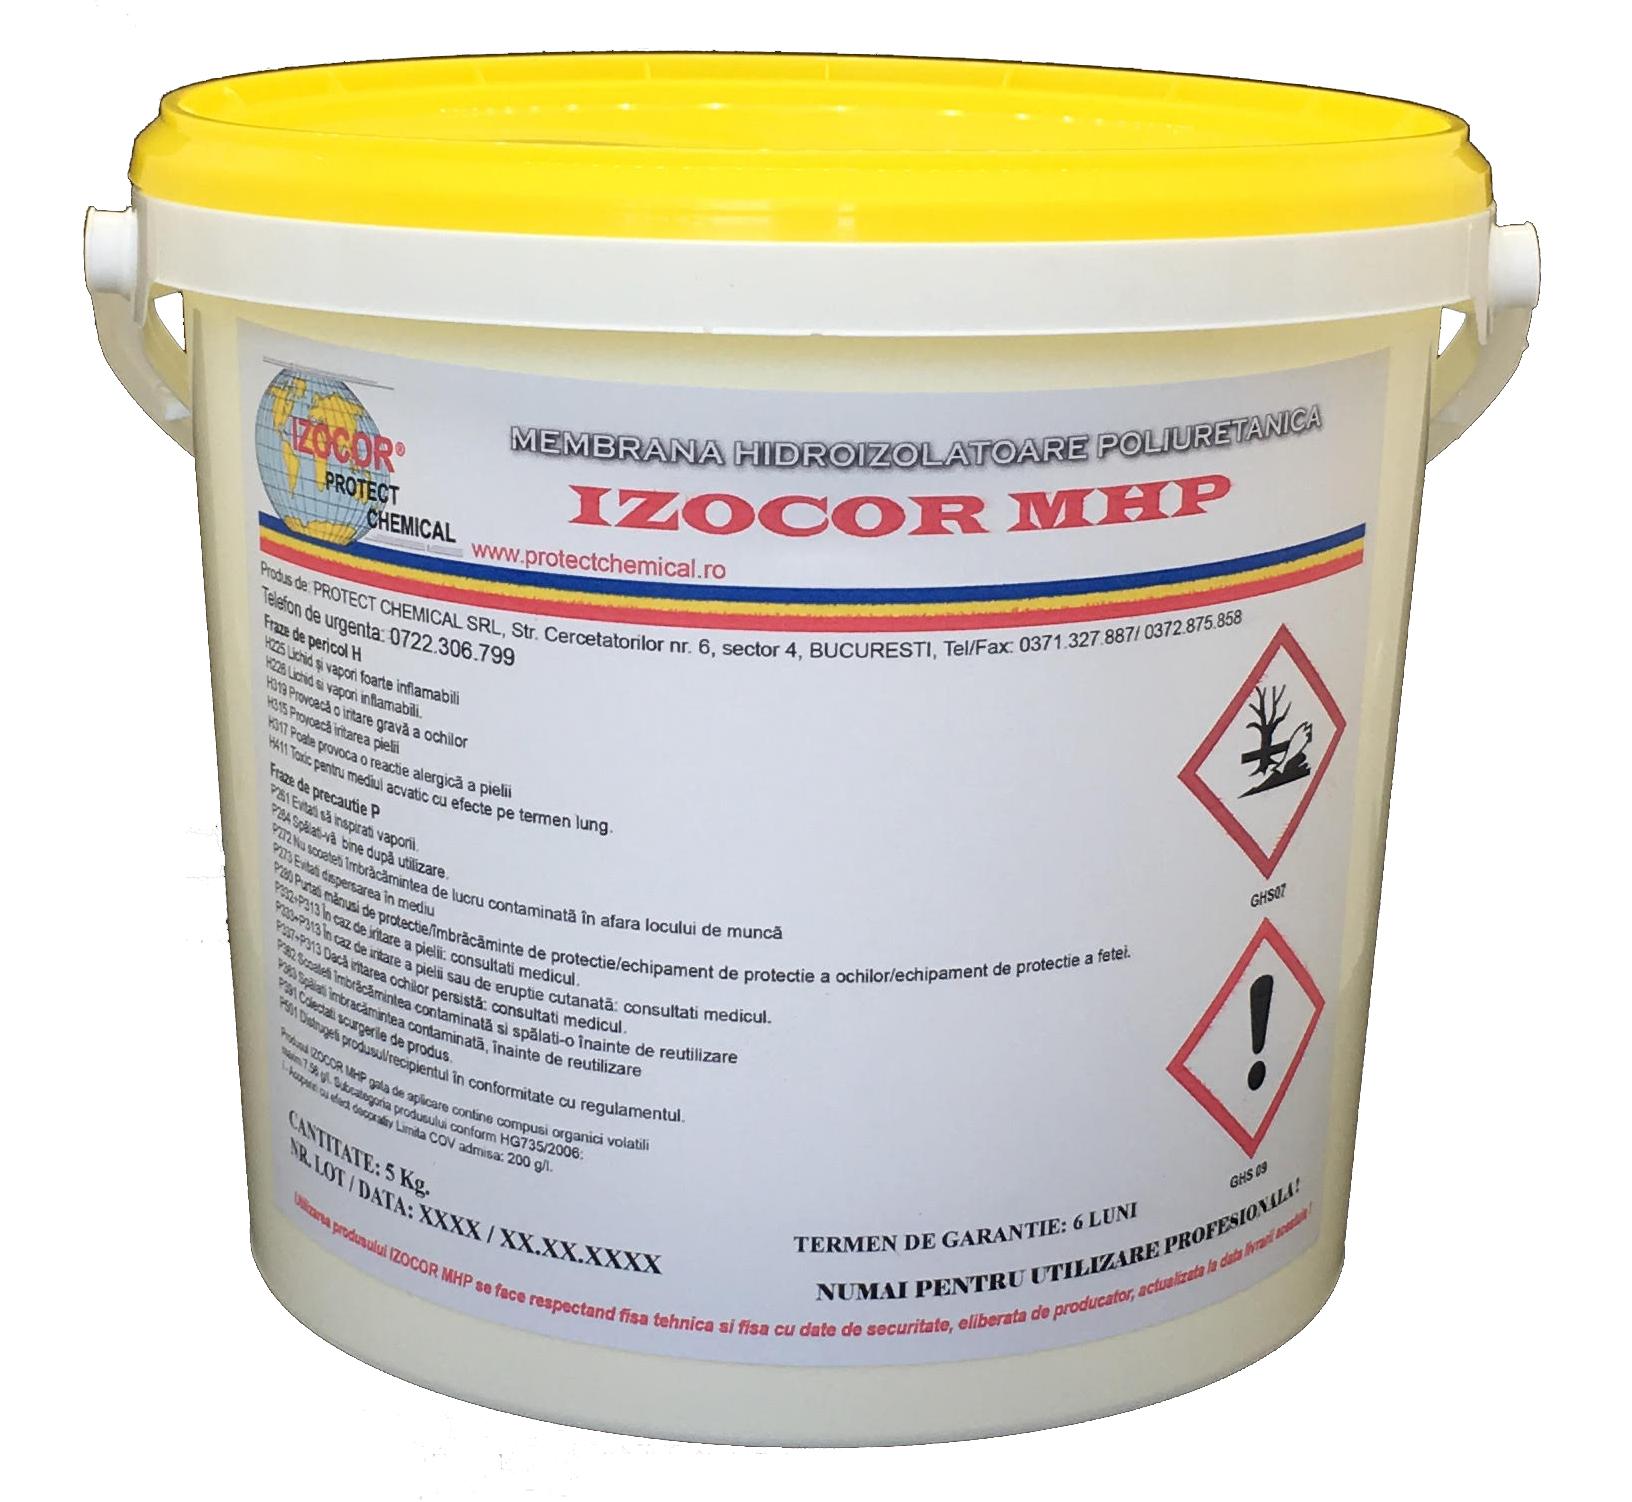 Membrana hidroizolatoare poliuretanica IZOCOR MHP, 5 kg Image